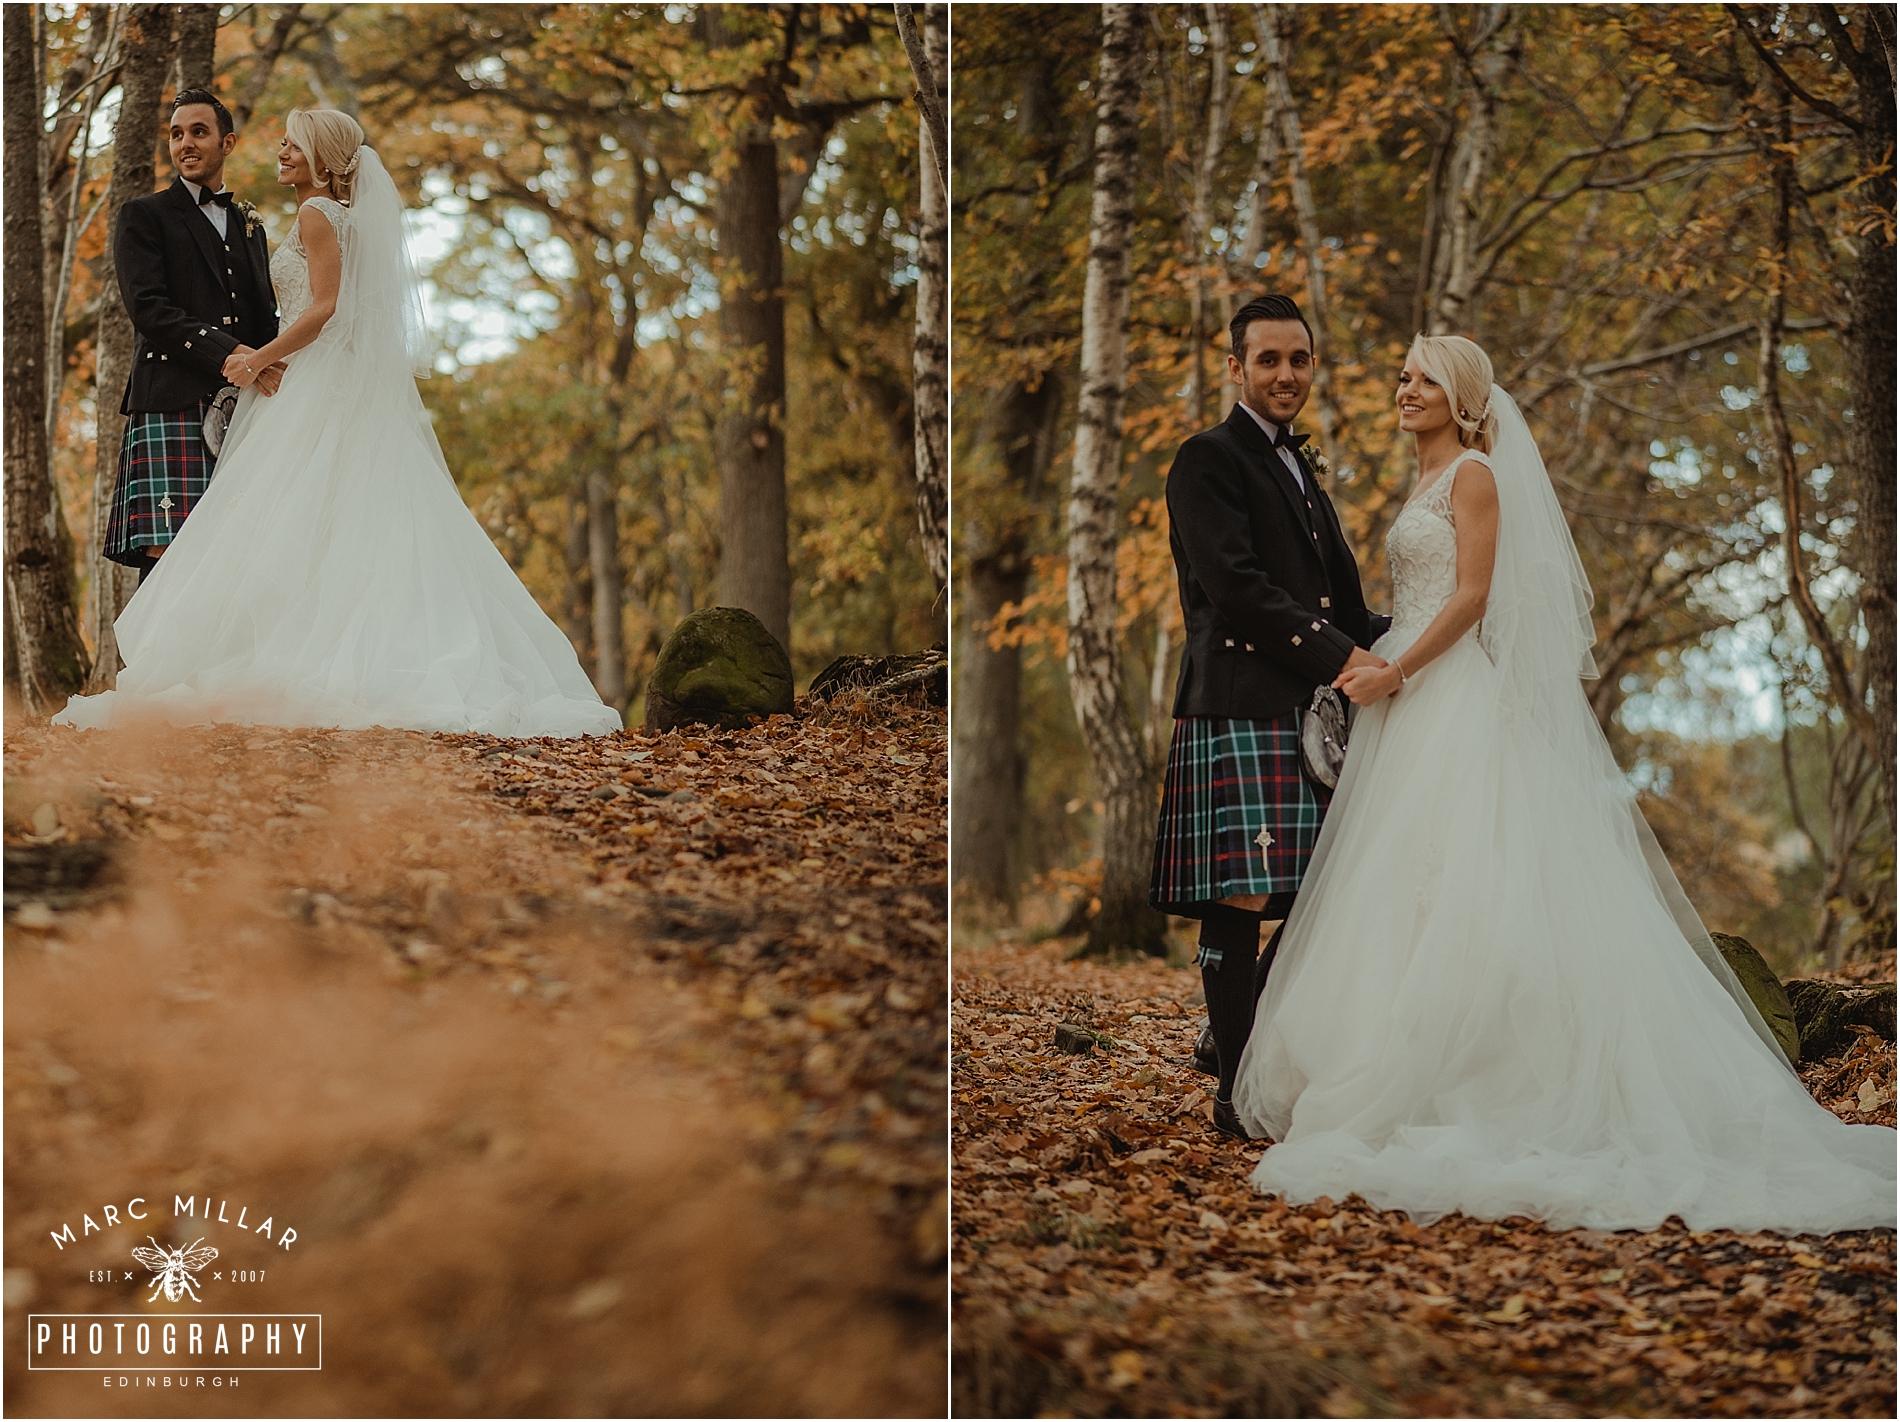 Fonab Castle Hotel Wedding Shoot by Marc Millar Photography